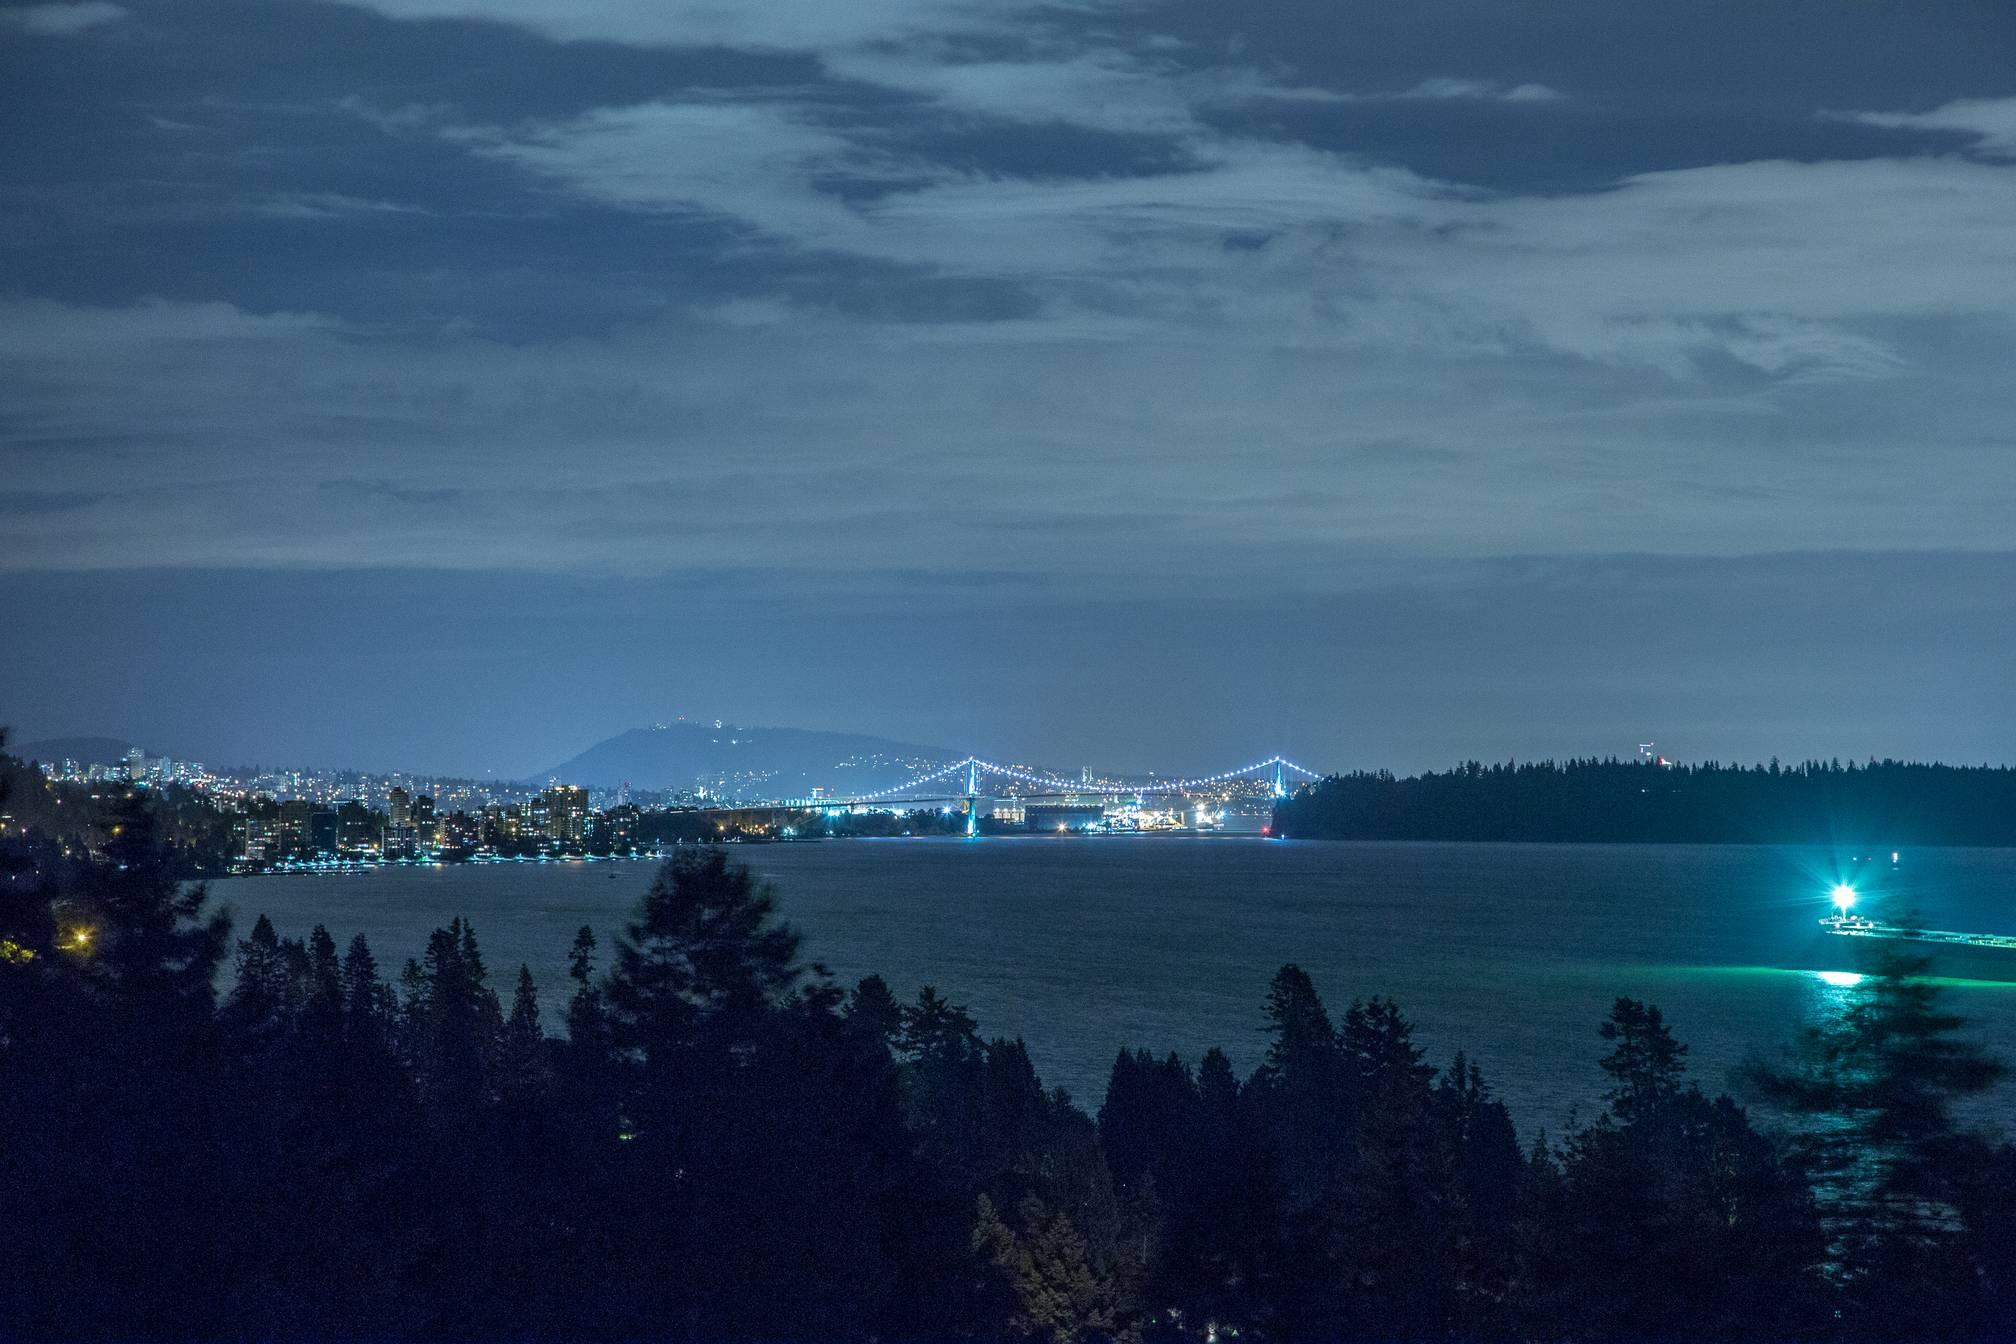 4672 Clovelly, Caulfeild, West Vancouver 2